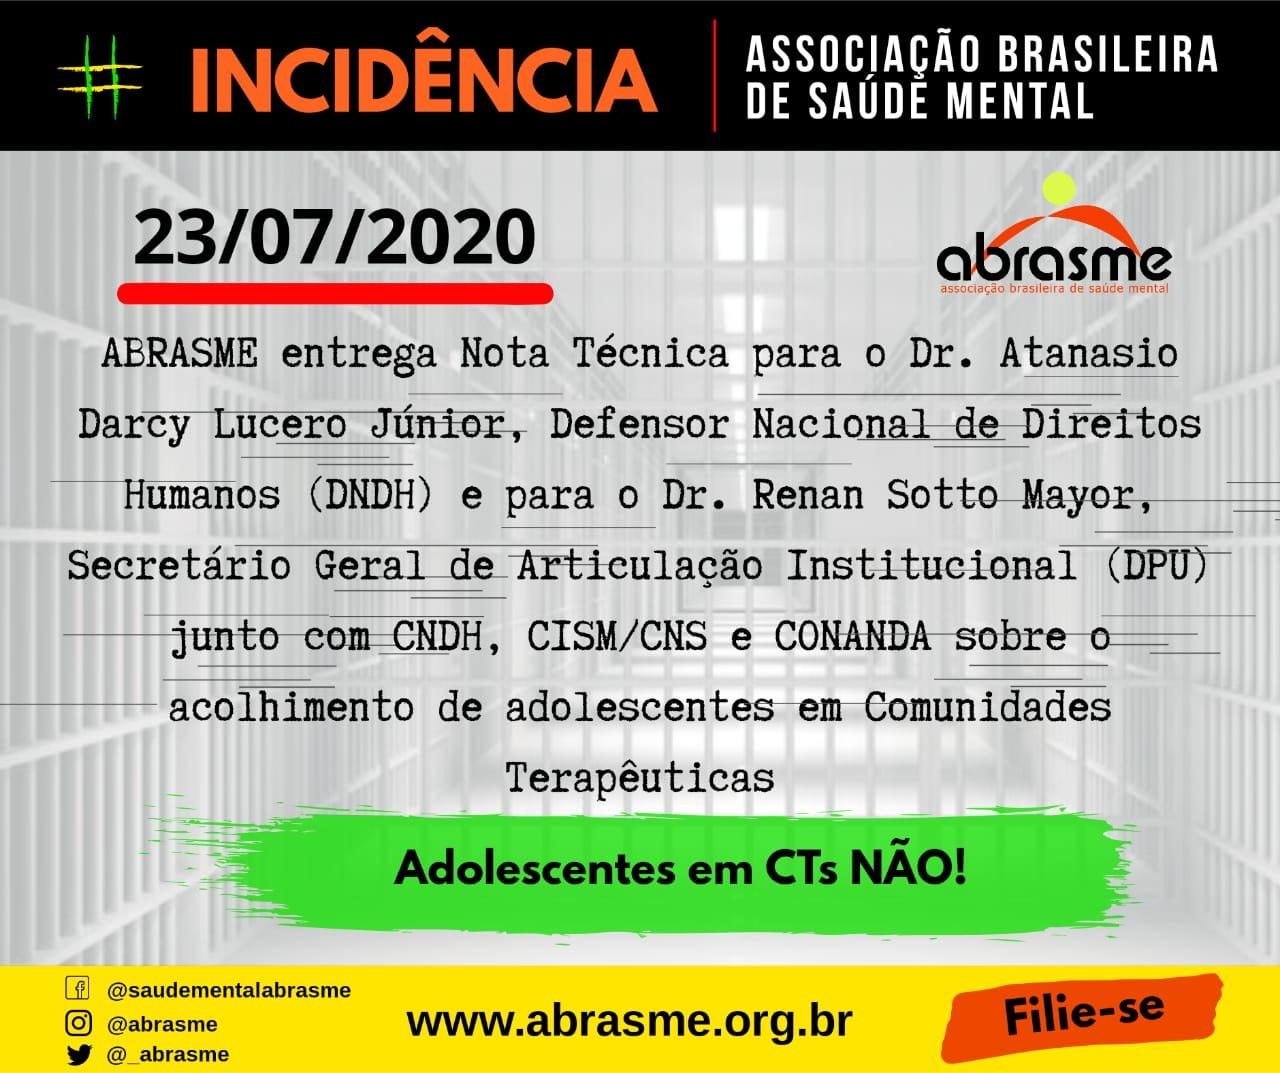 ABRASME entrega Nota Técnica para o Dr. Atanasio Darcy Lucero Junior (DNDH)